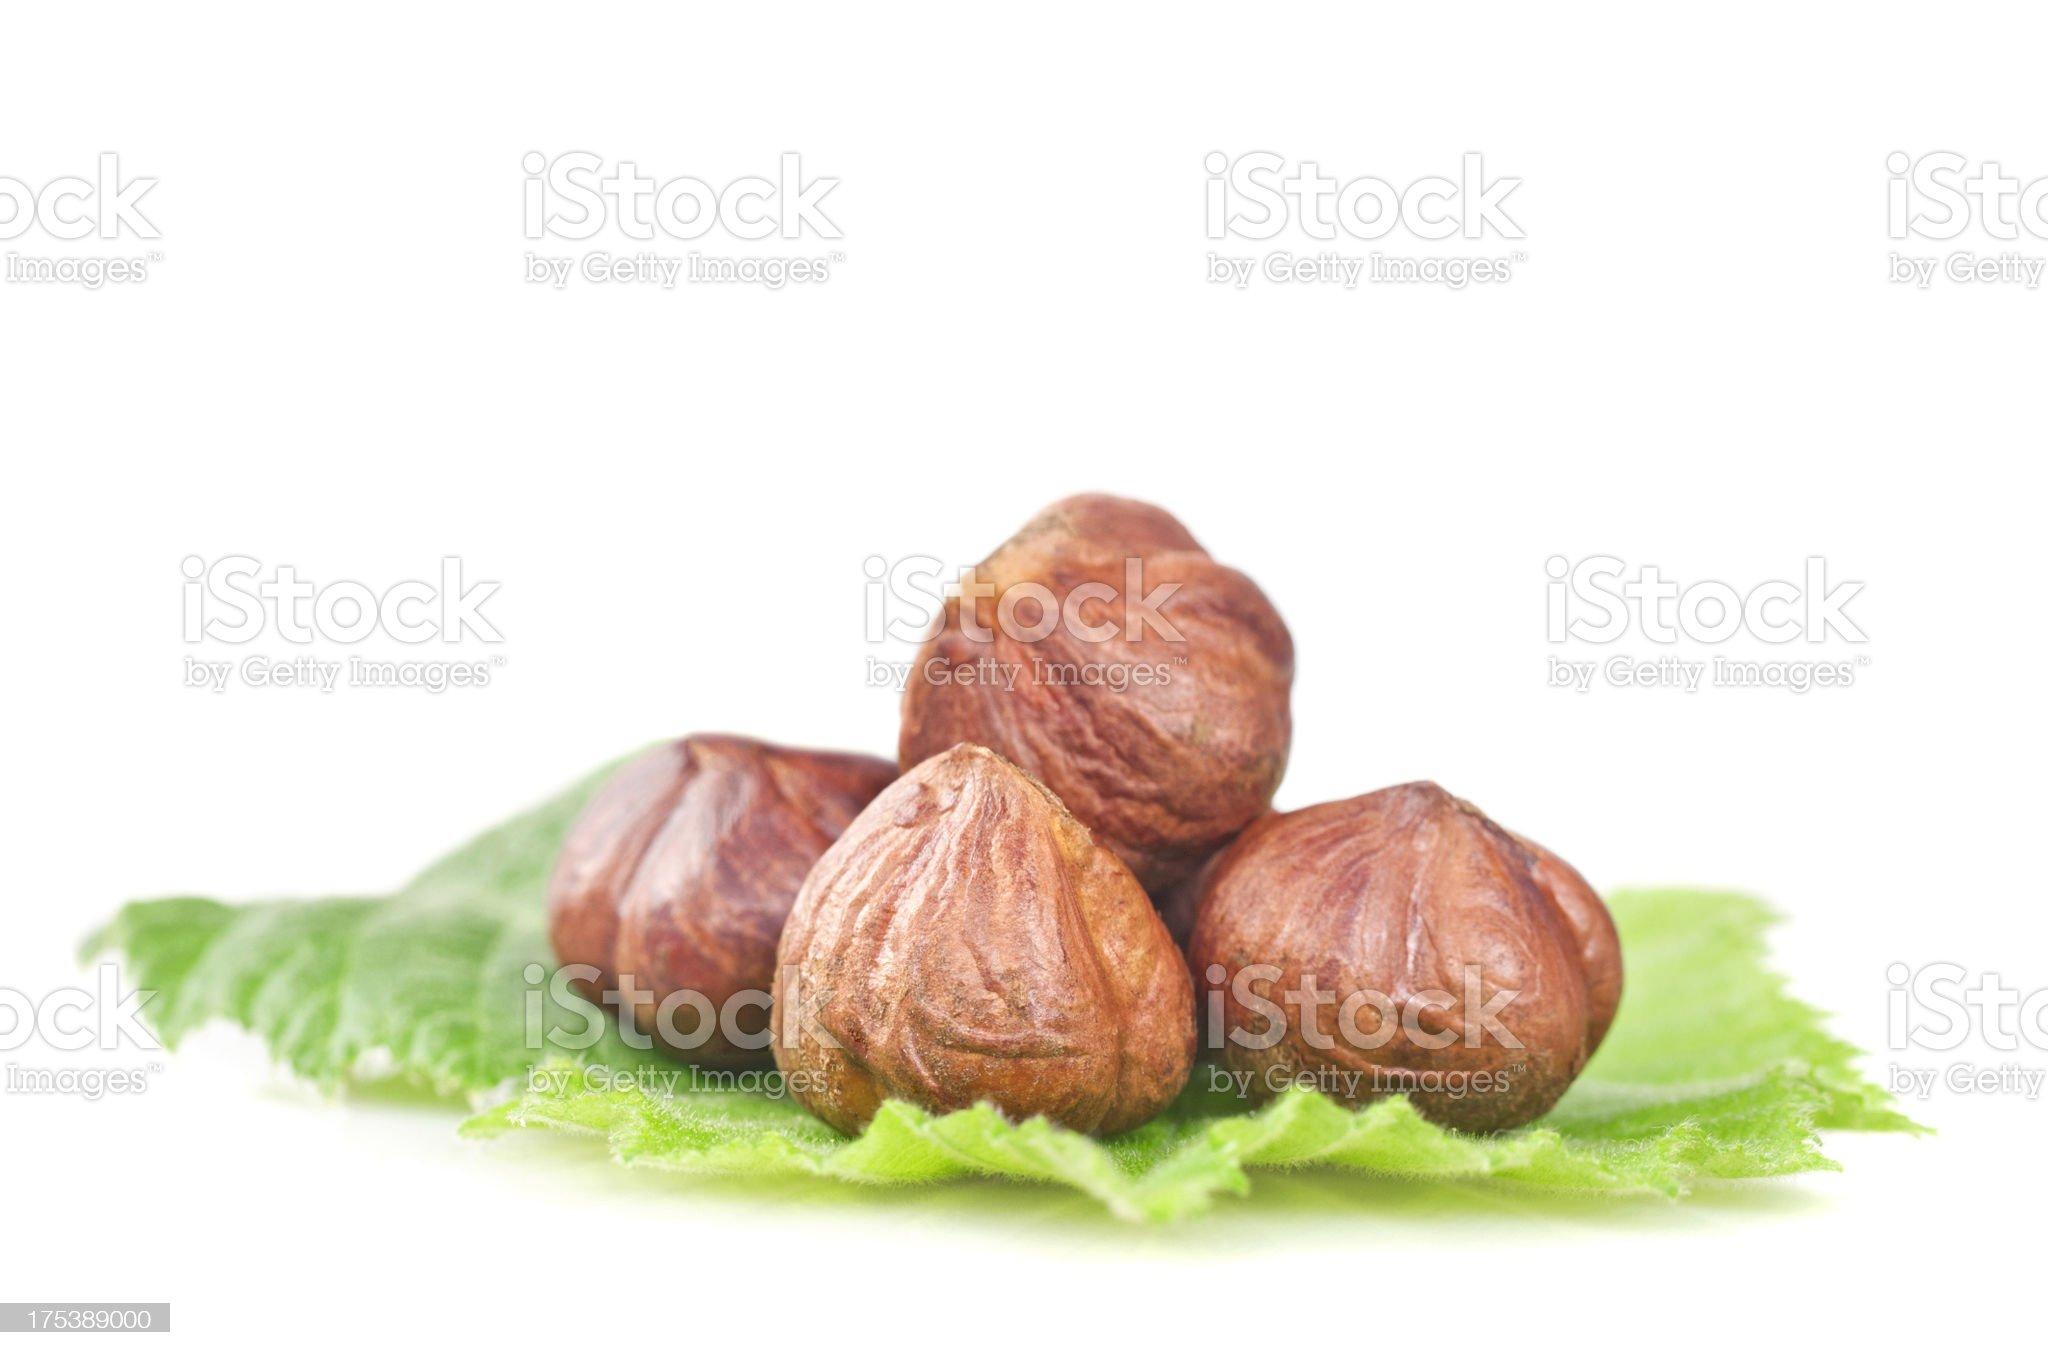 Hazelnuts on leaf royalty-free stock photo